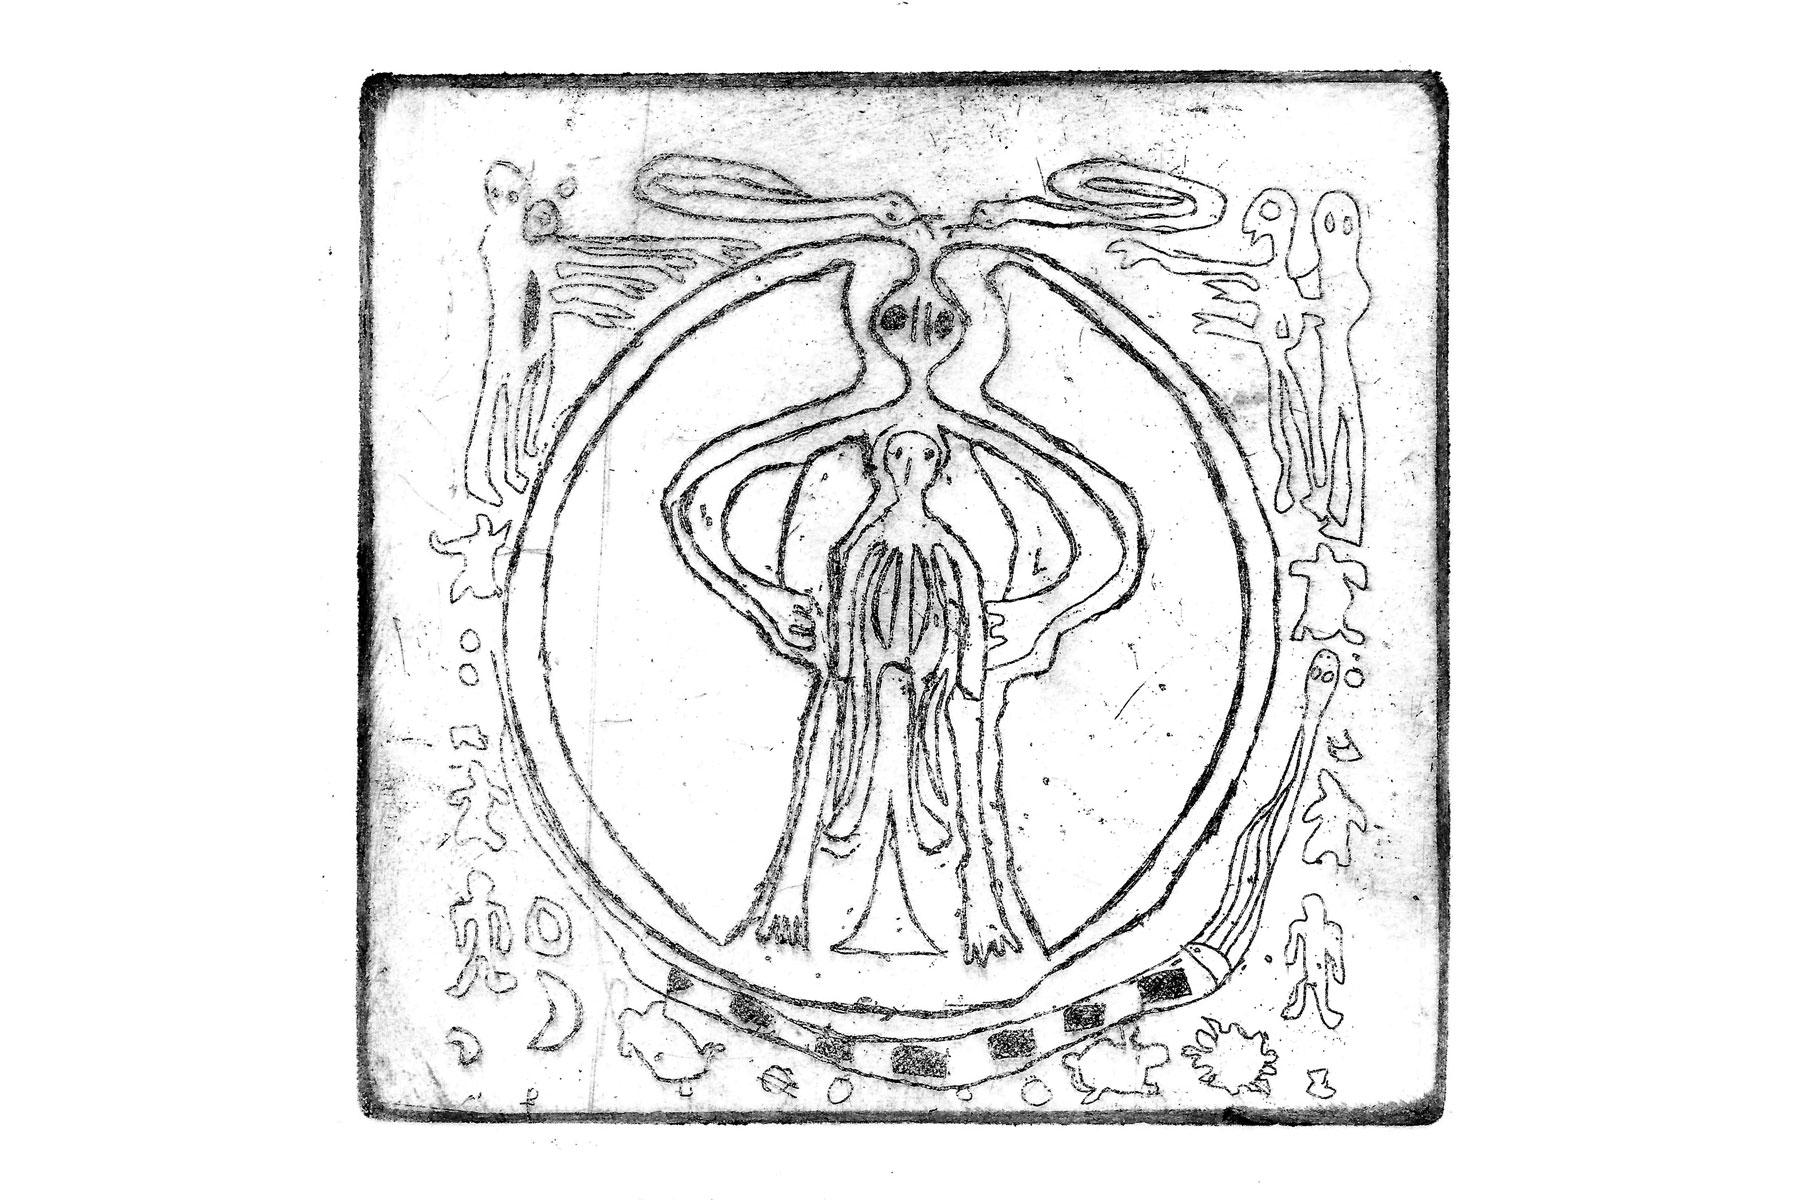 intaglio copper etching print